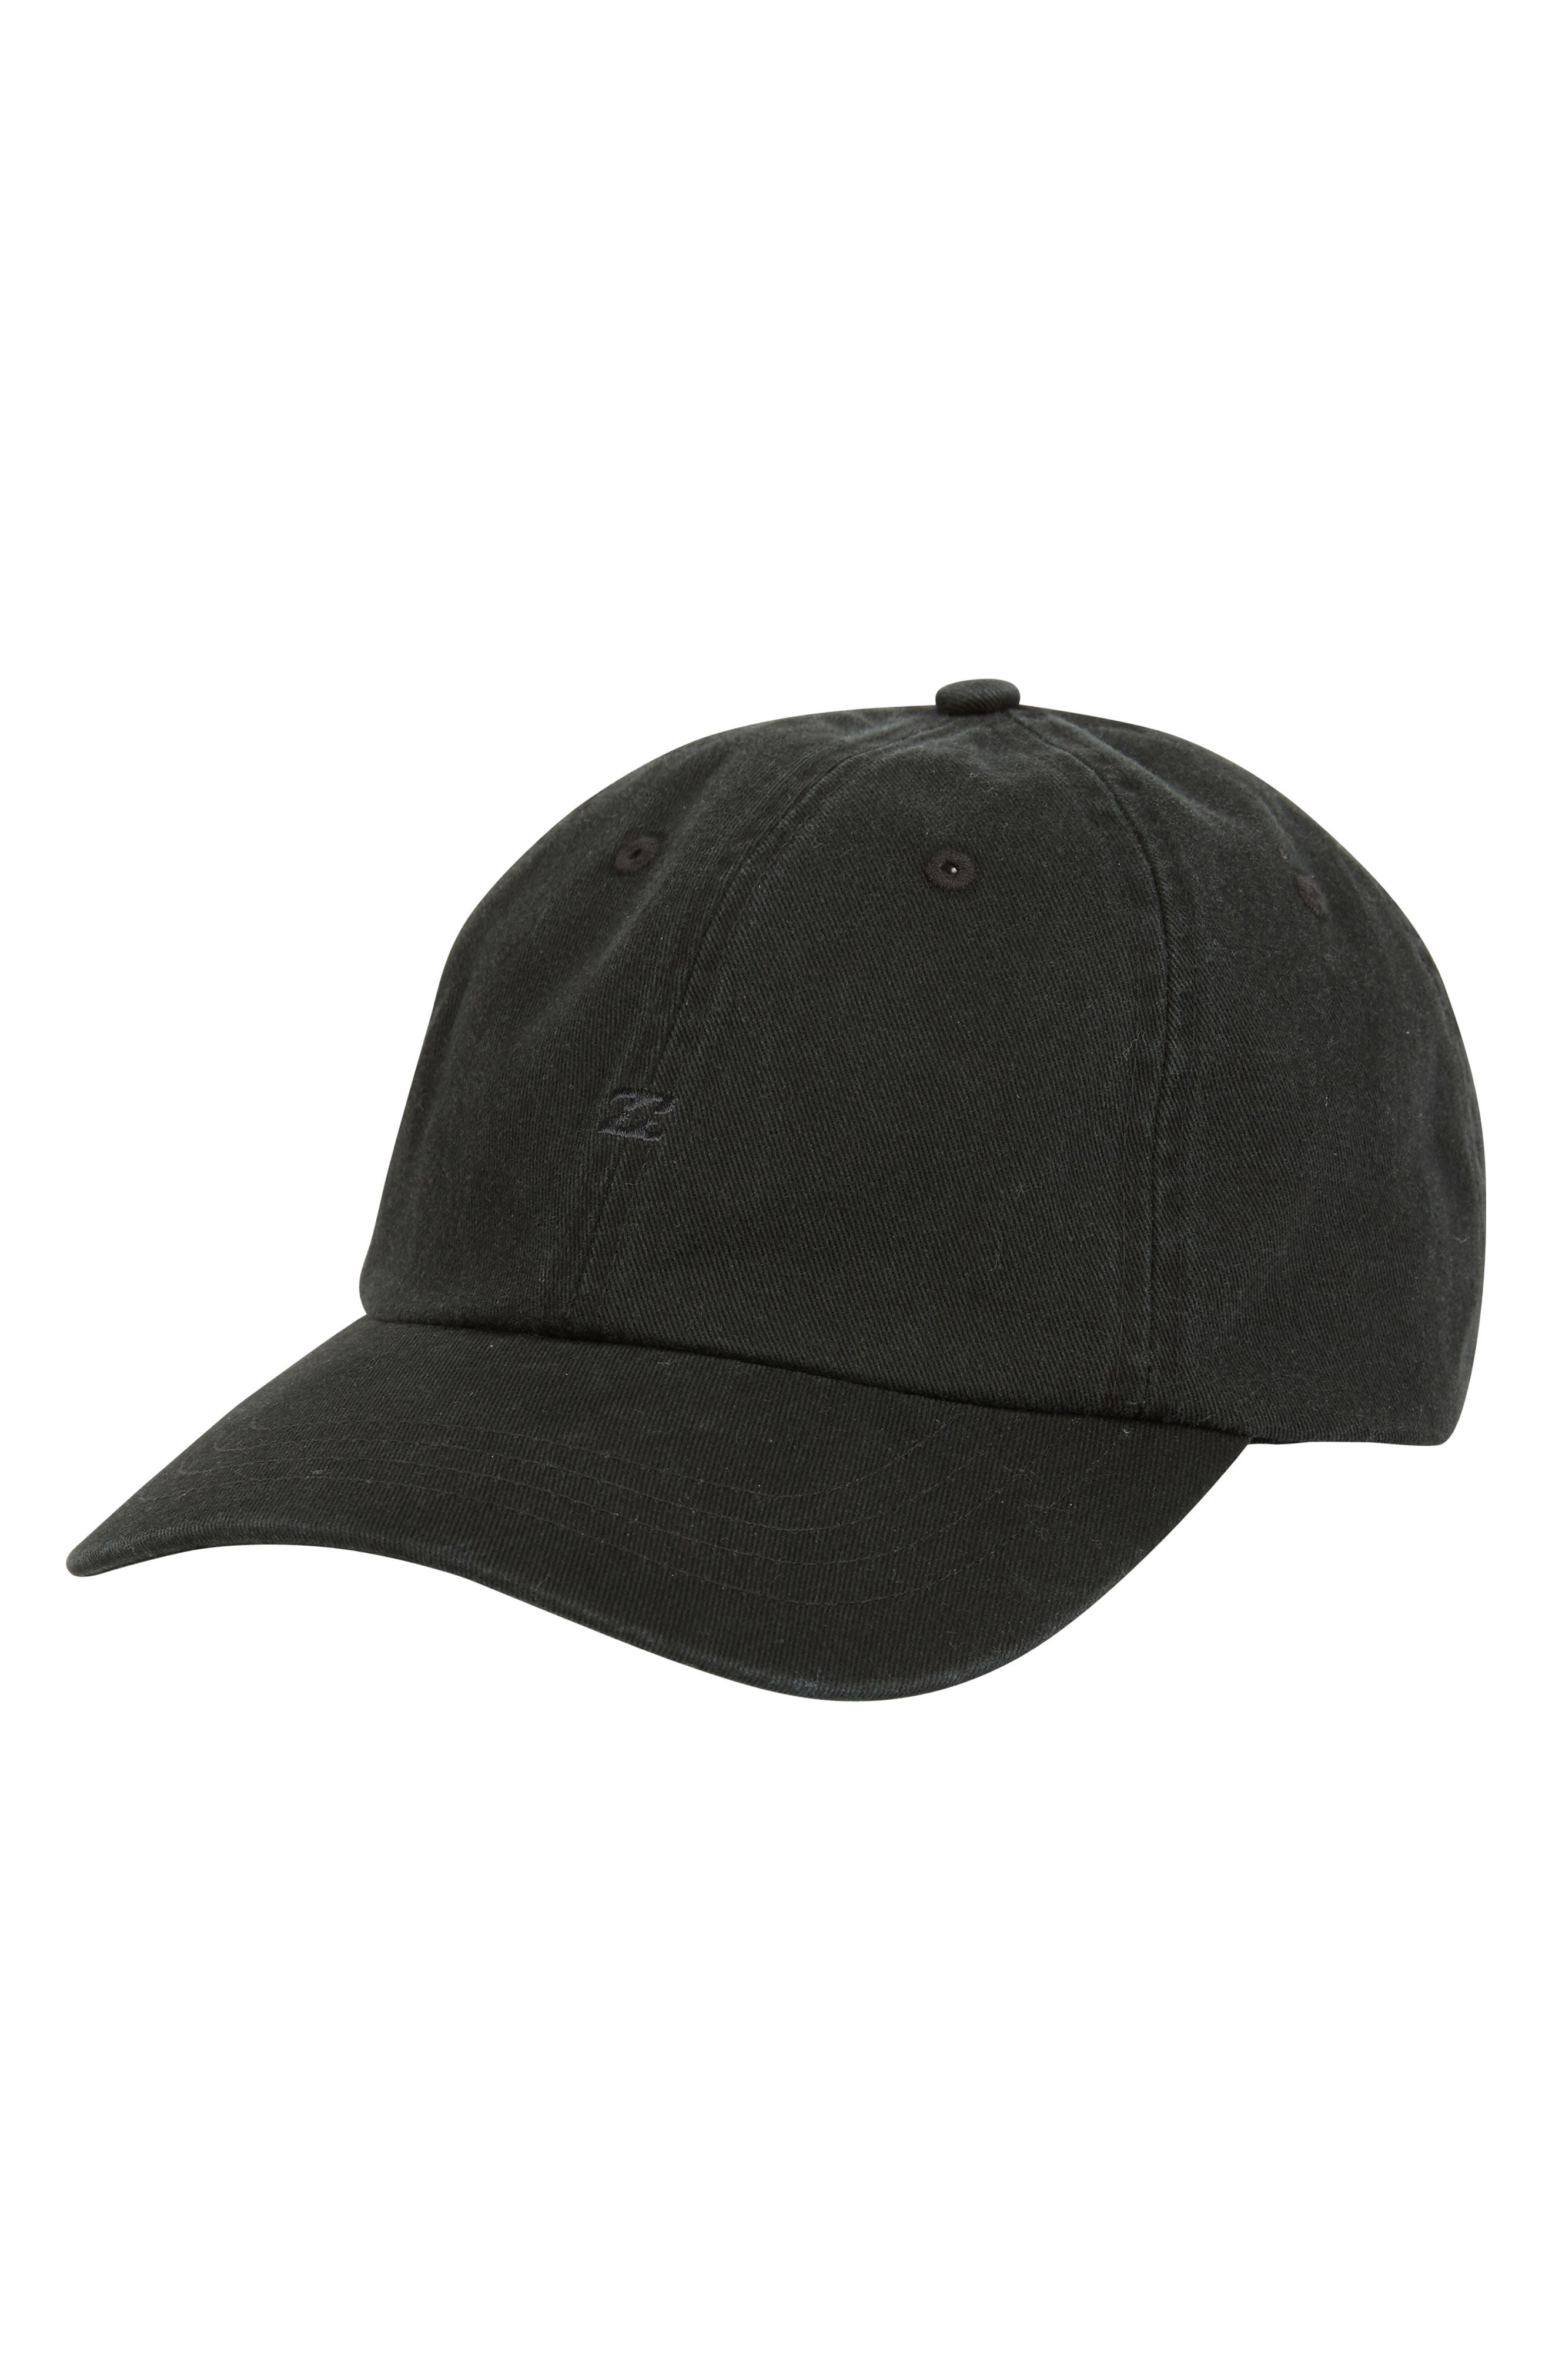 All Day Baseball Cap,                         Main,                         color, RAVEN